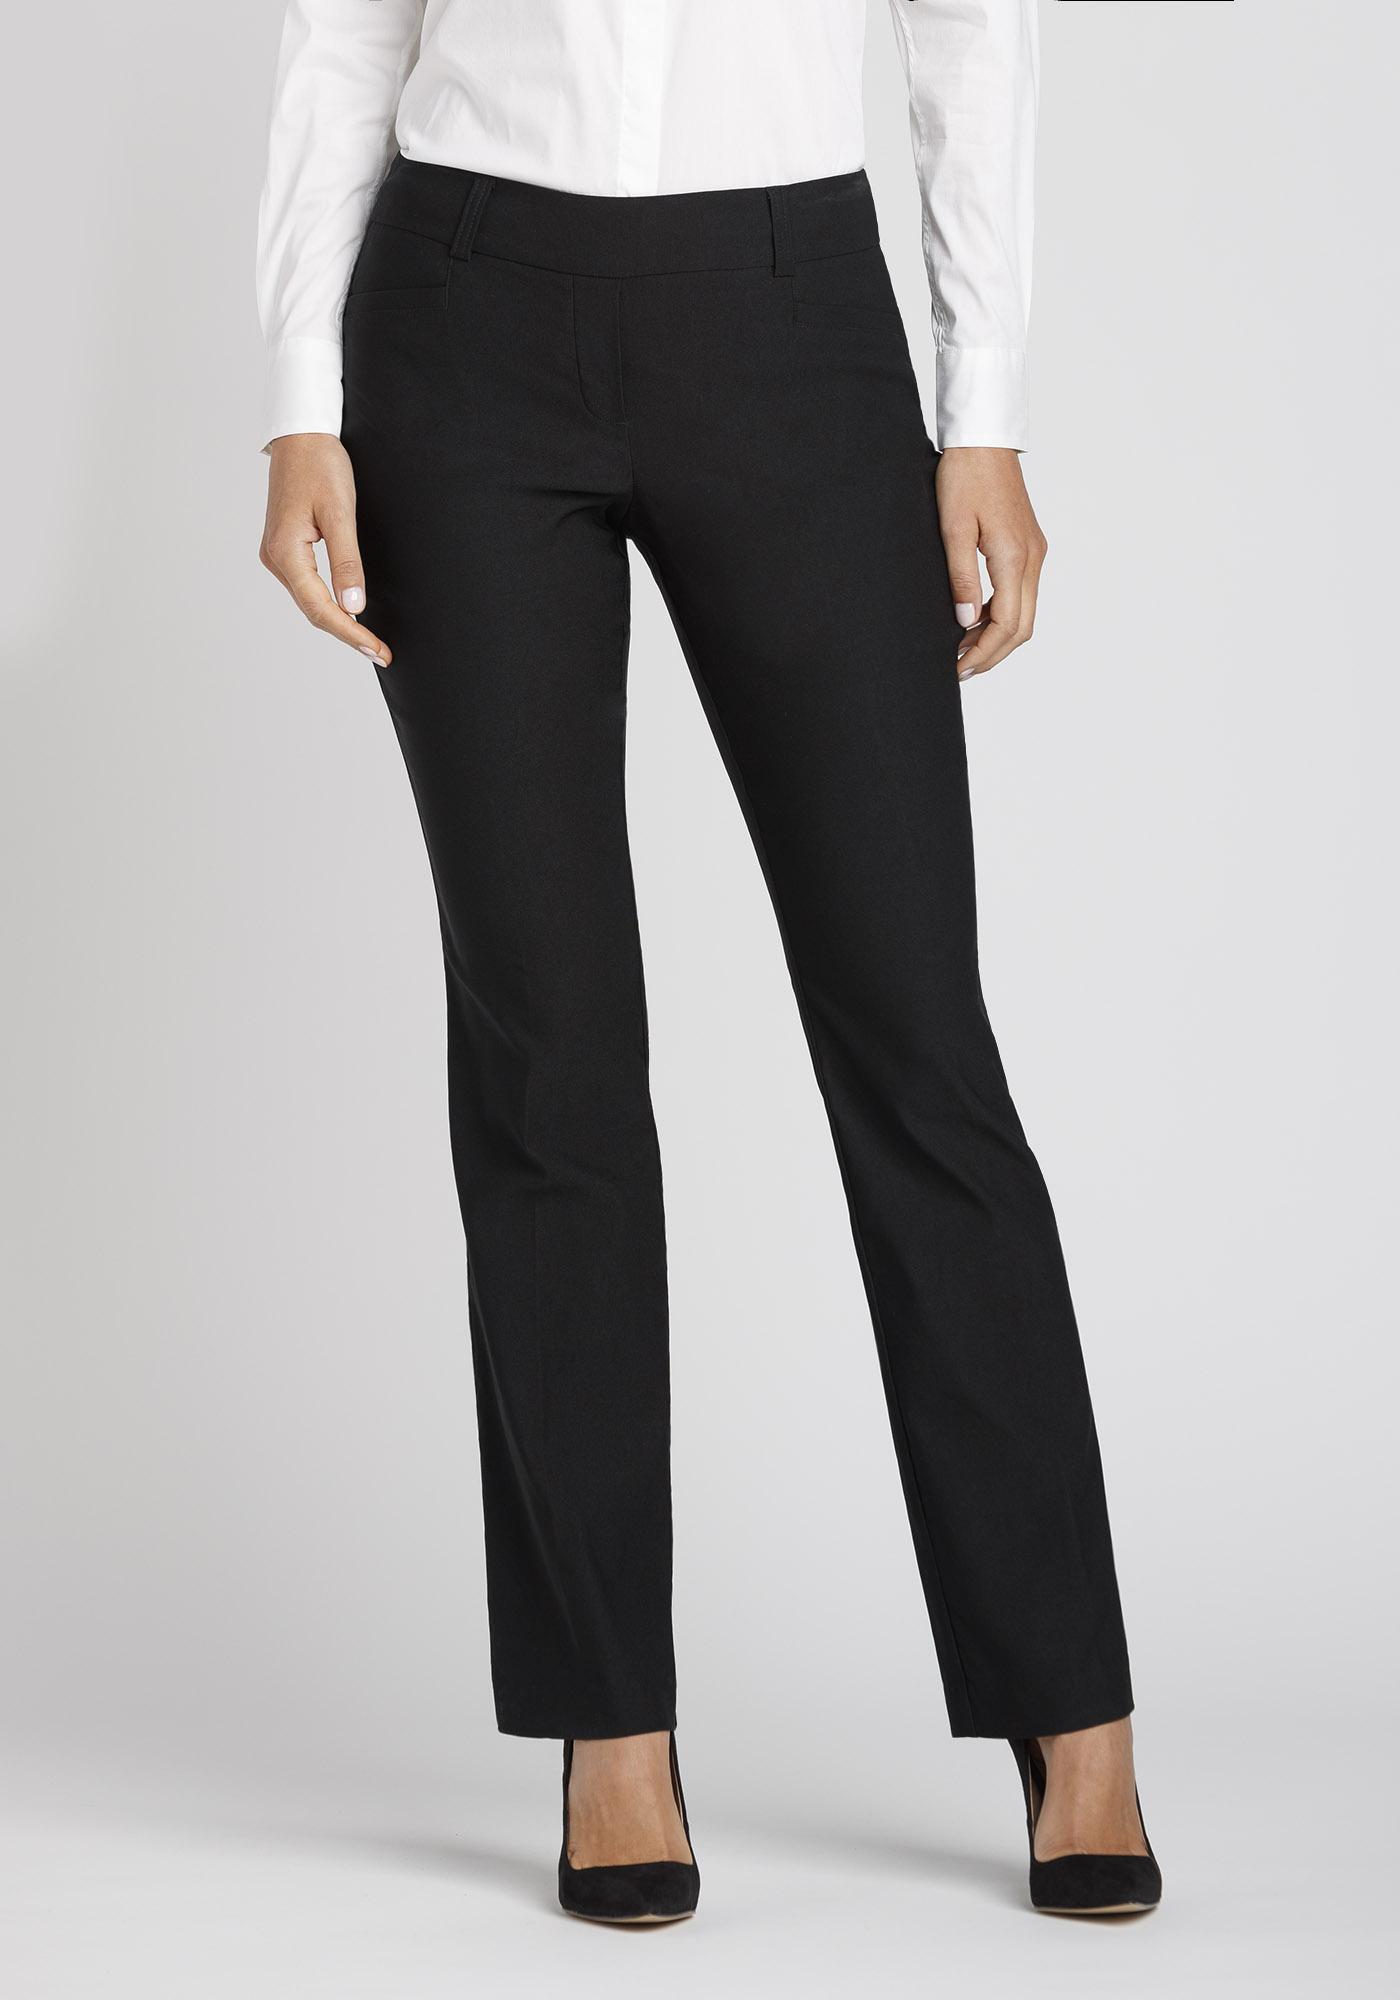 495b19d5dda1 Women s High Rise Straight Dress Pant